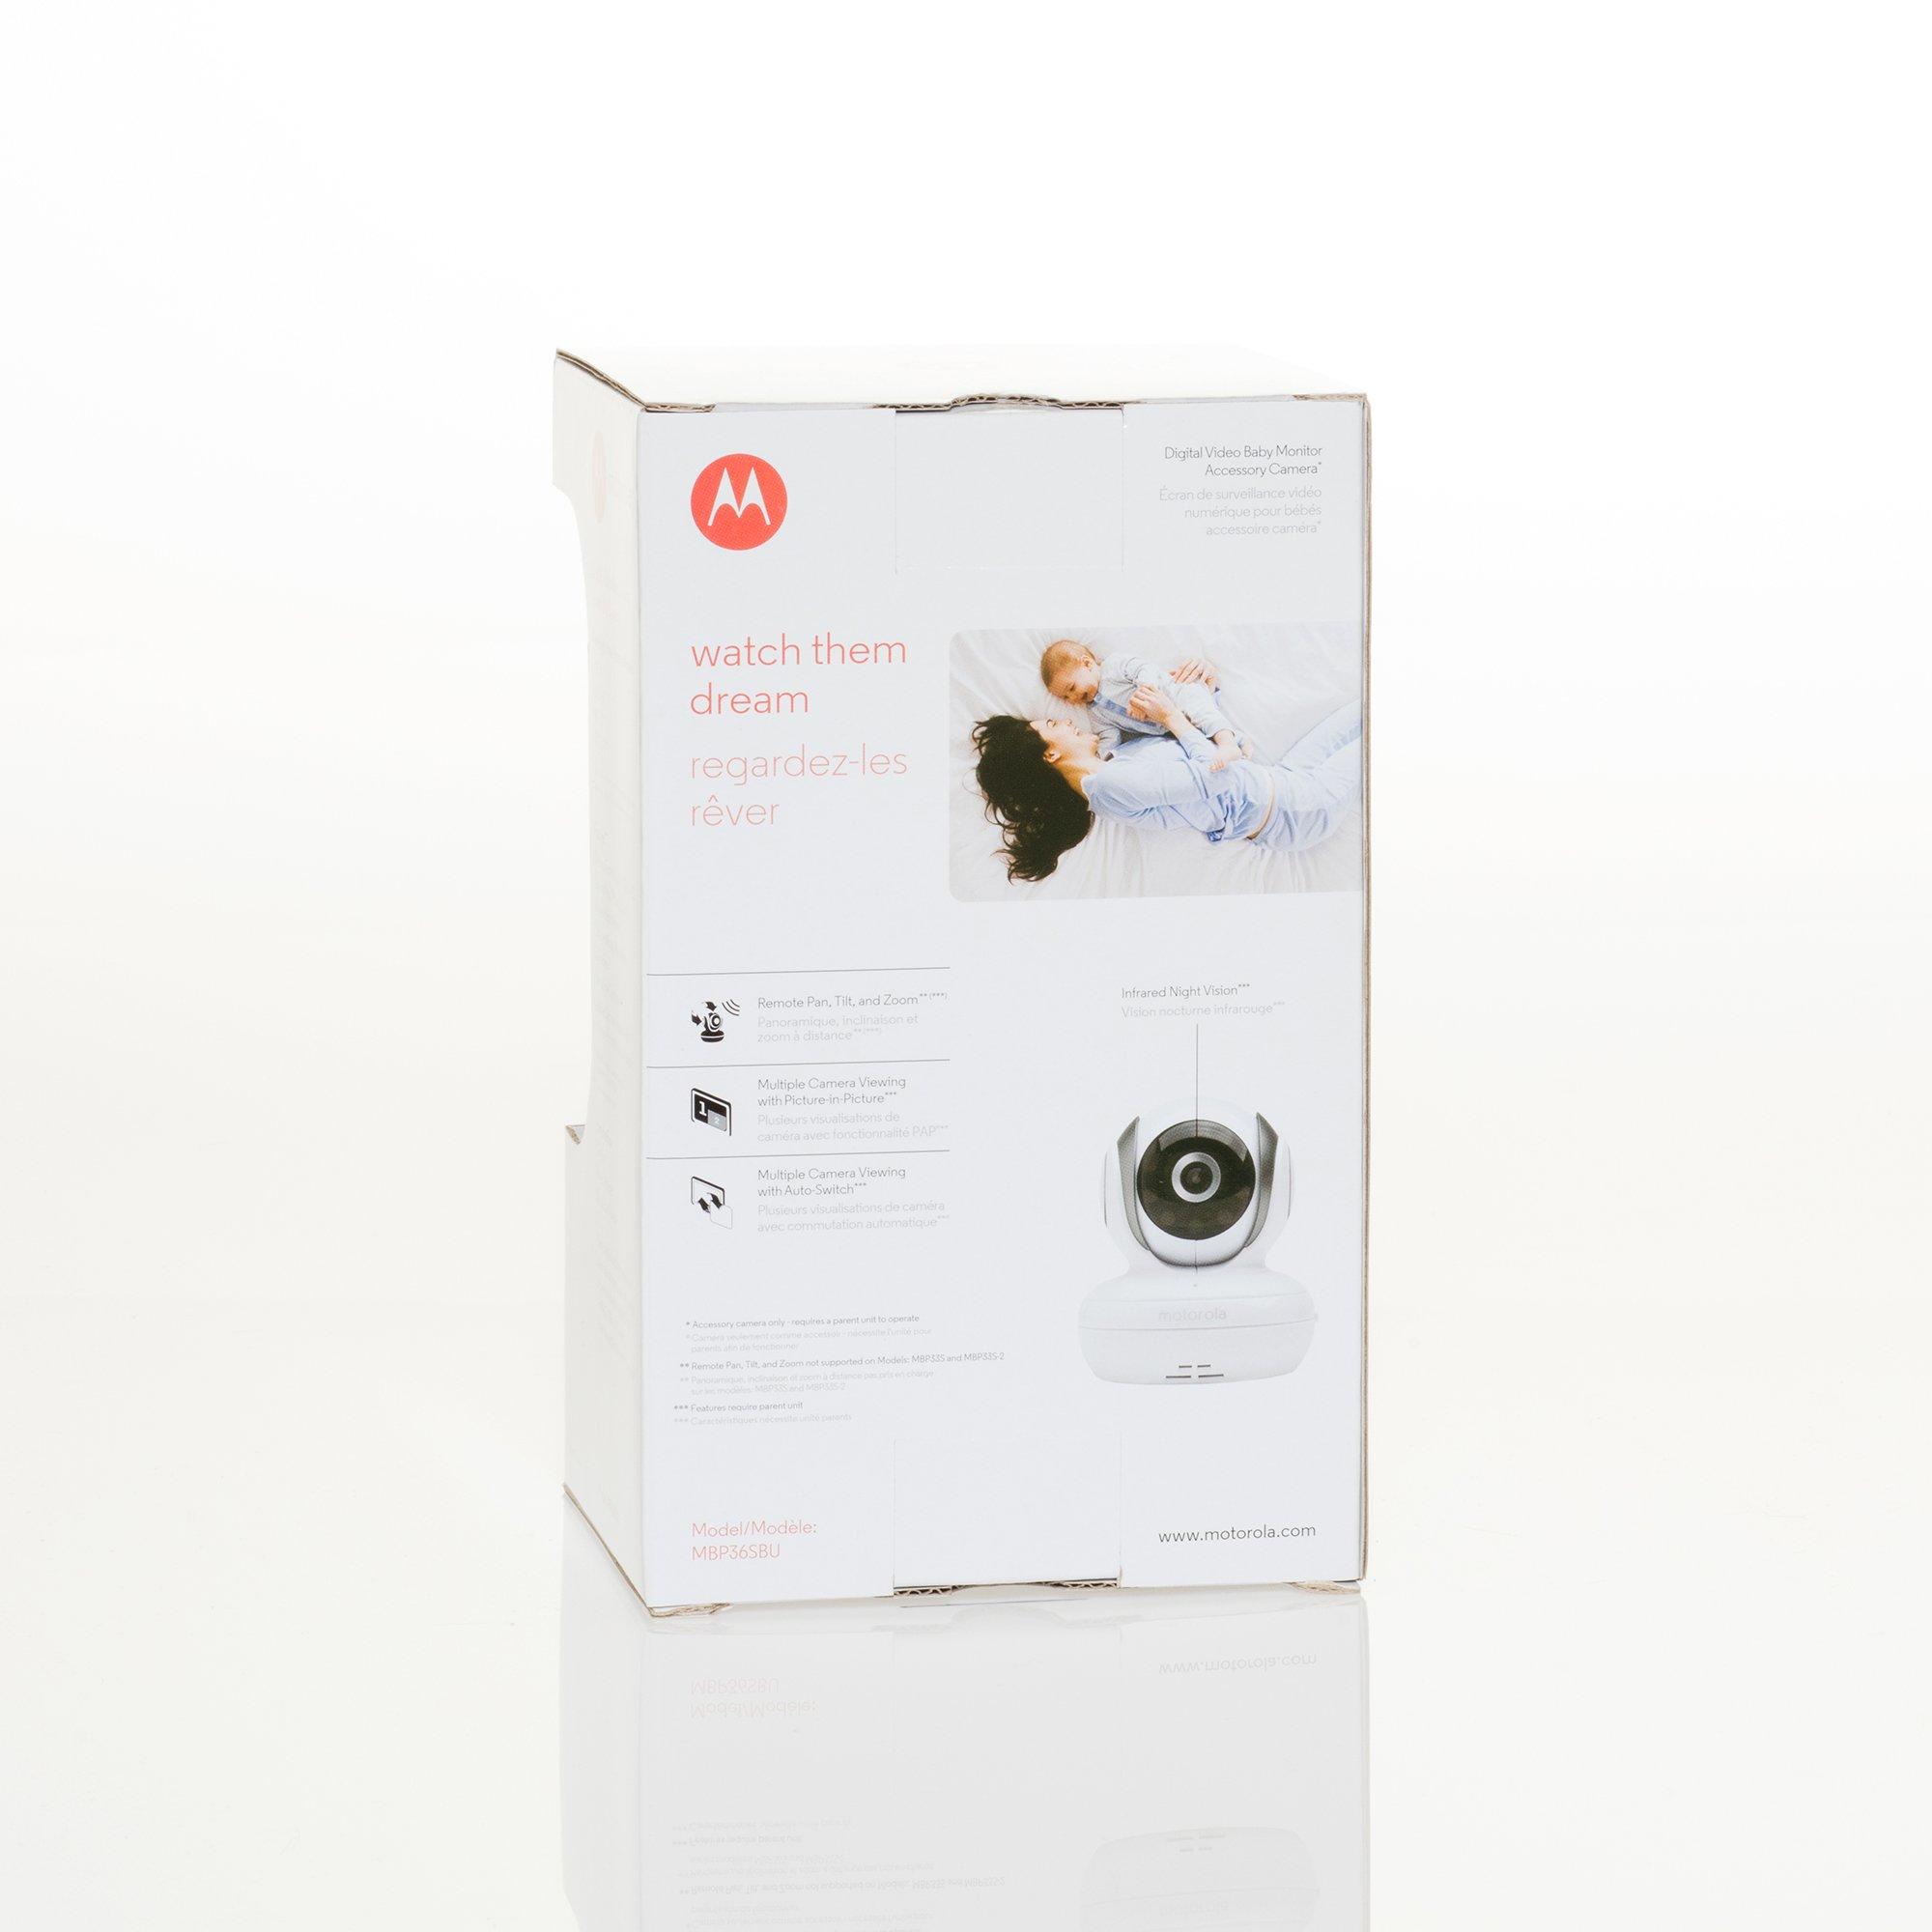 Motorola Additional Camera for Motorola MBP33S and MBP36S Baby Monitors (MBP36SBU) by Motorola (Image #5)